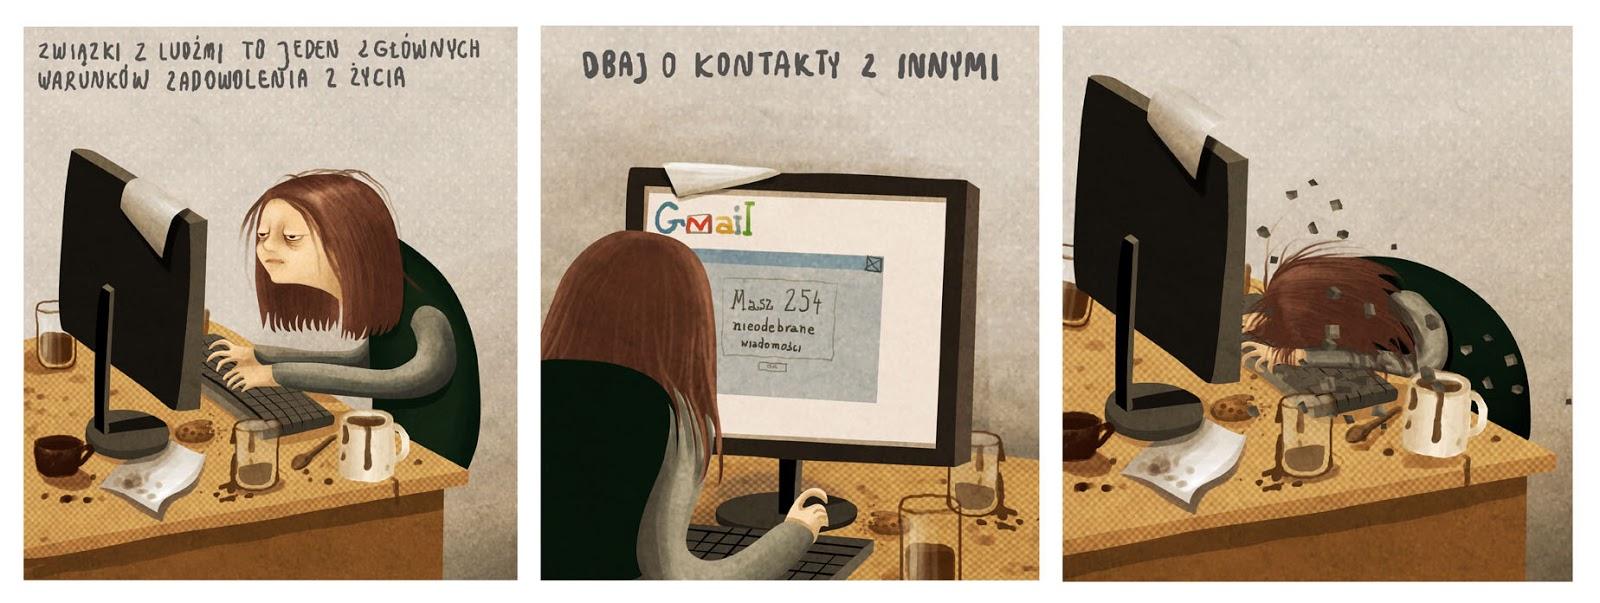 ilustracje, emilia dziubak